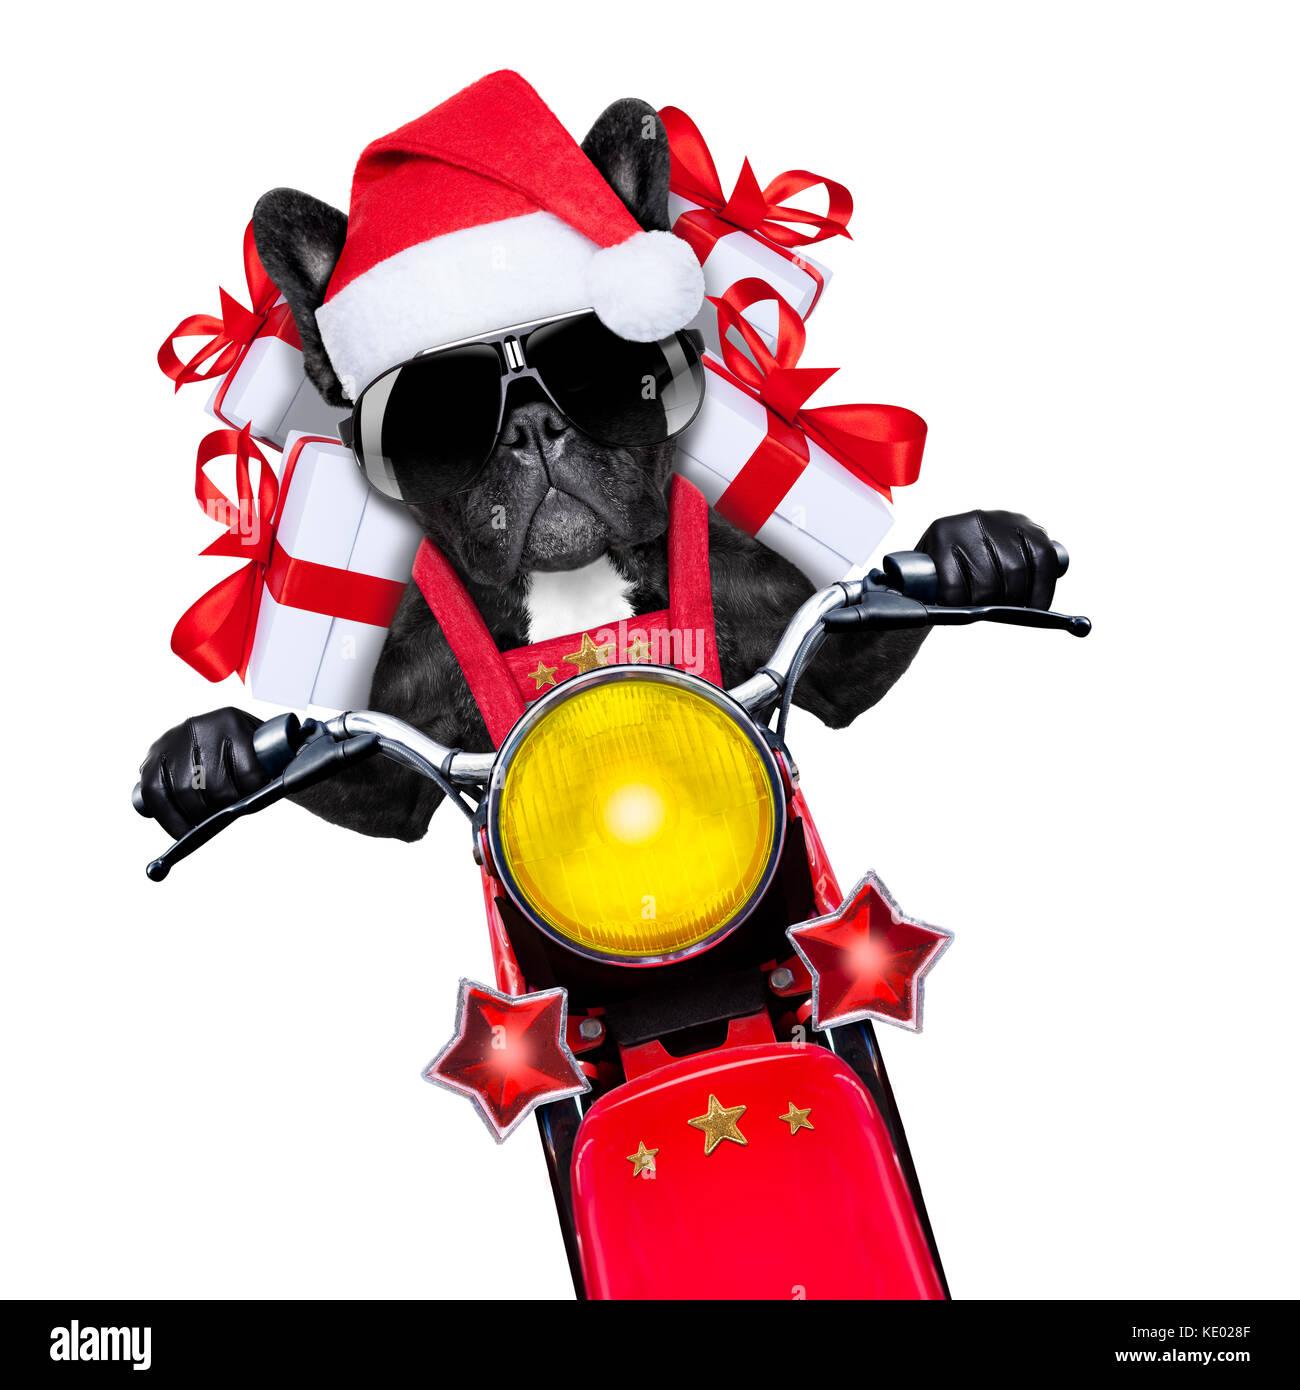 santa claus dog on motorbike bringing presents or gifts to everyone